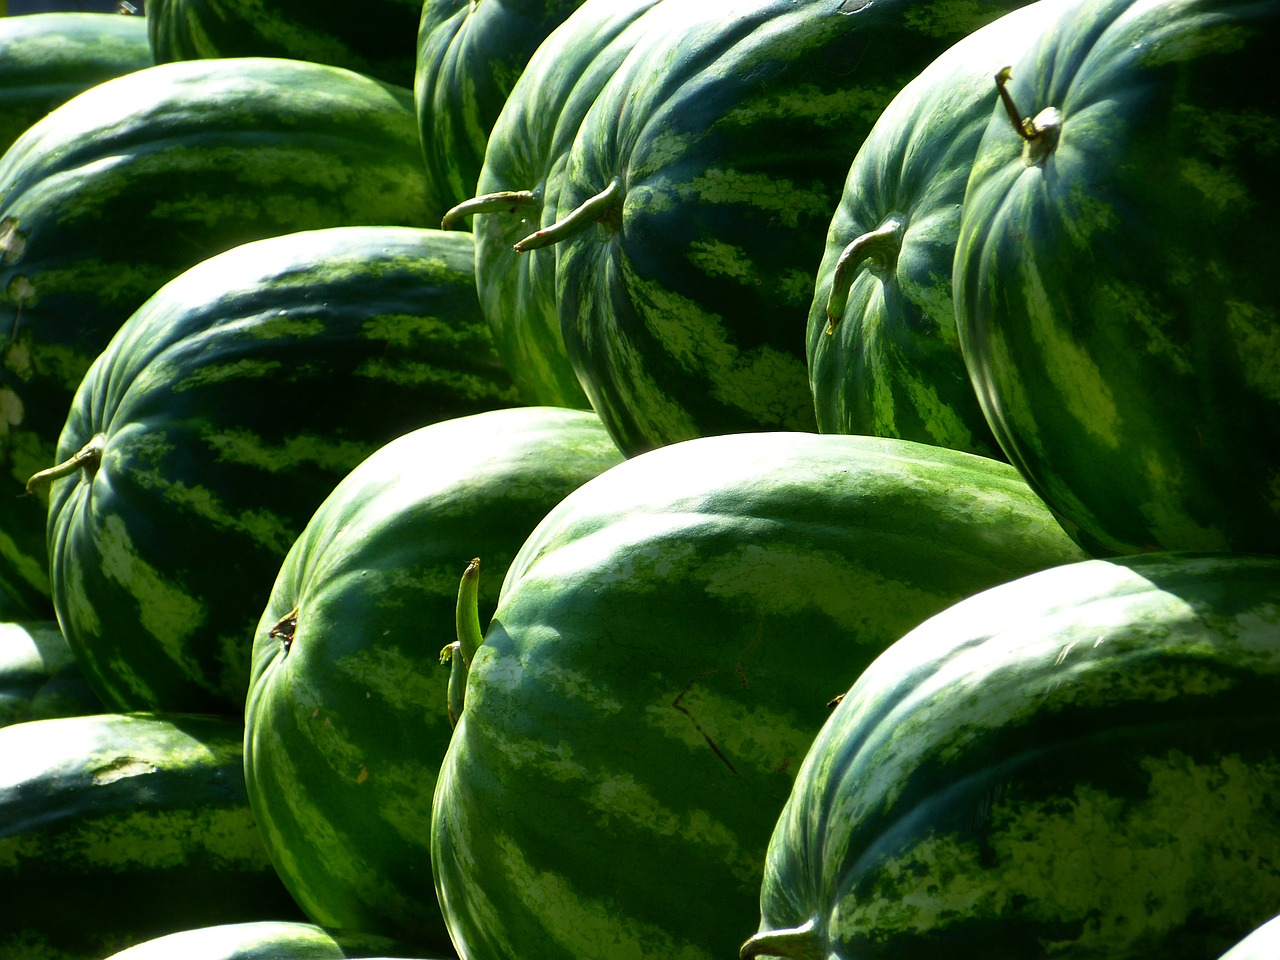 melons-197025_1280.jpg